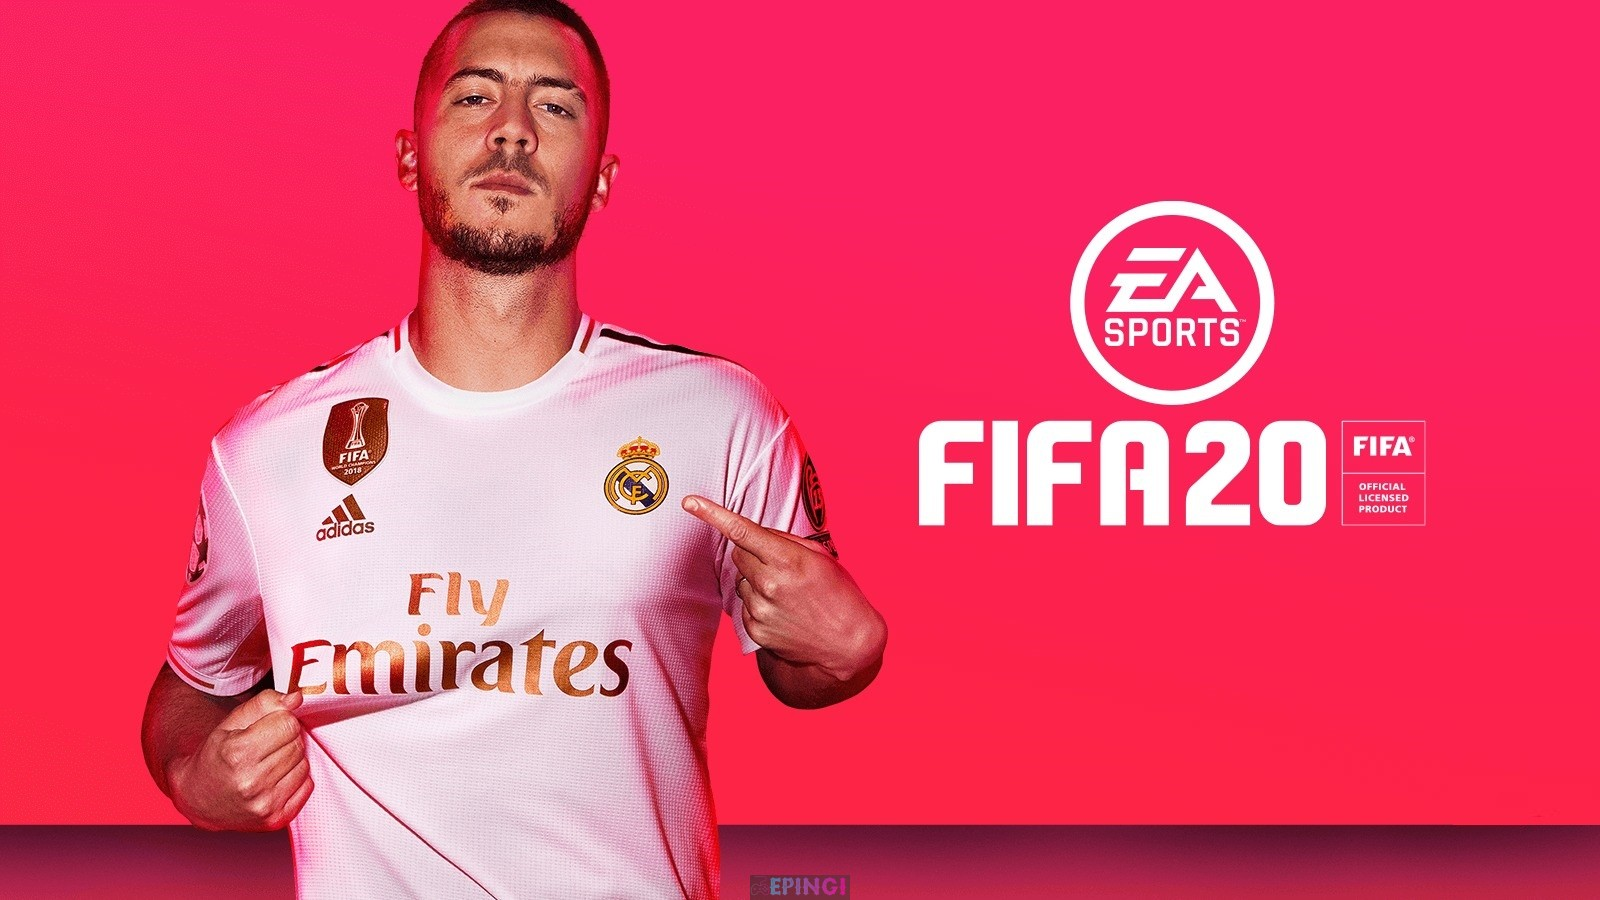 Fifa 20 demo pc free download windows 7